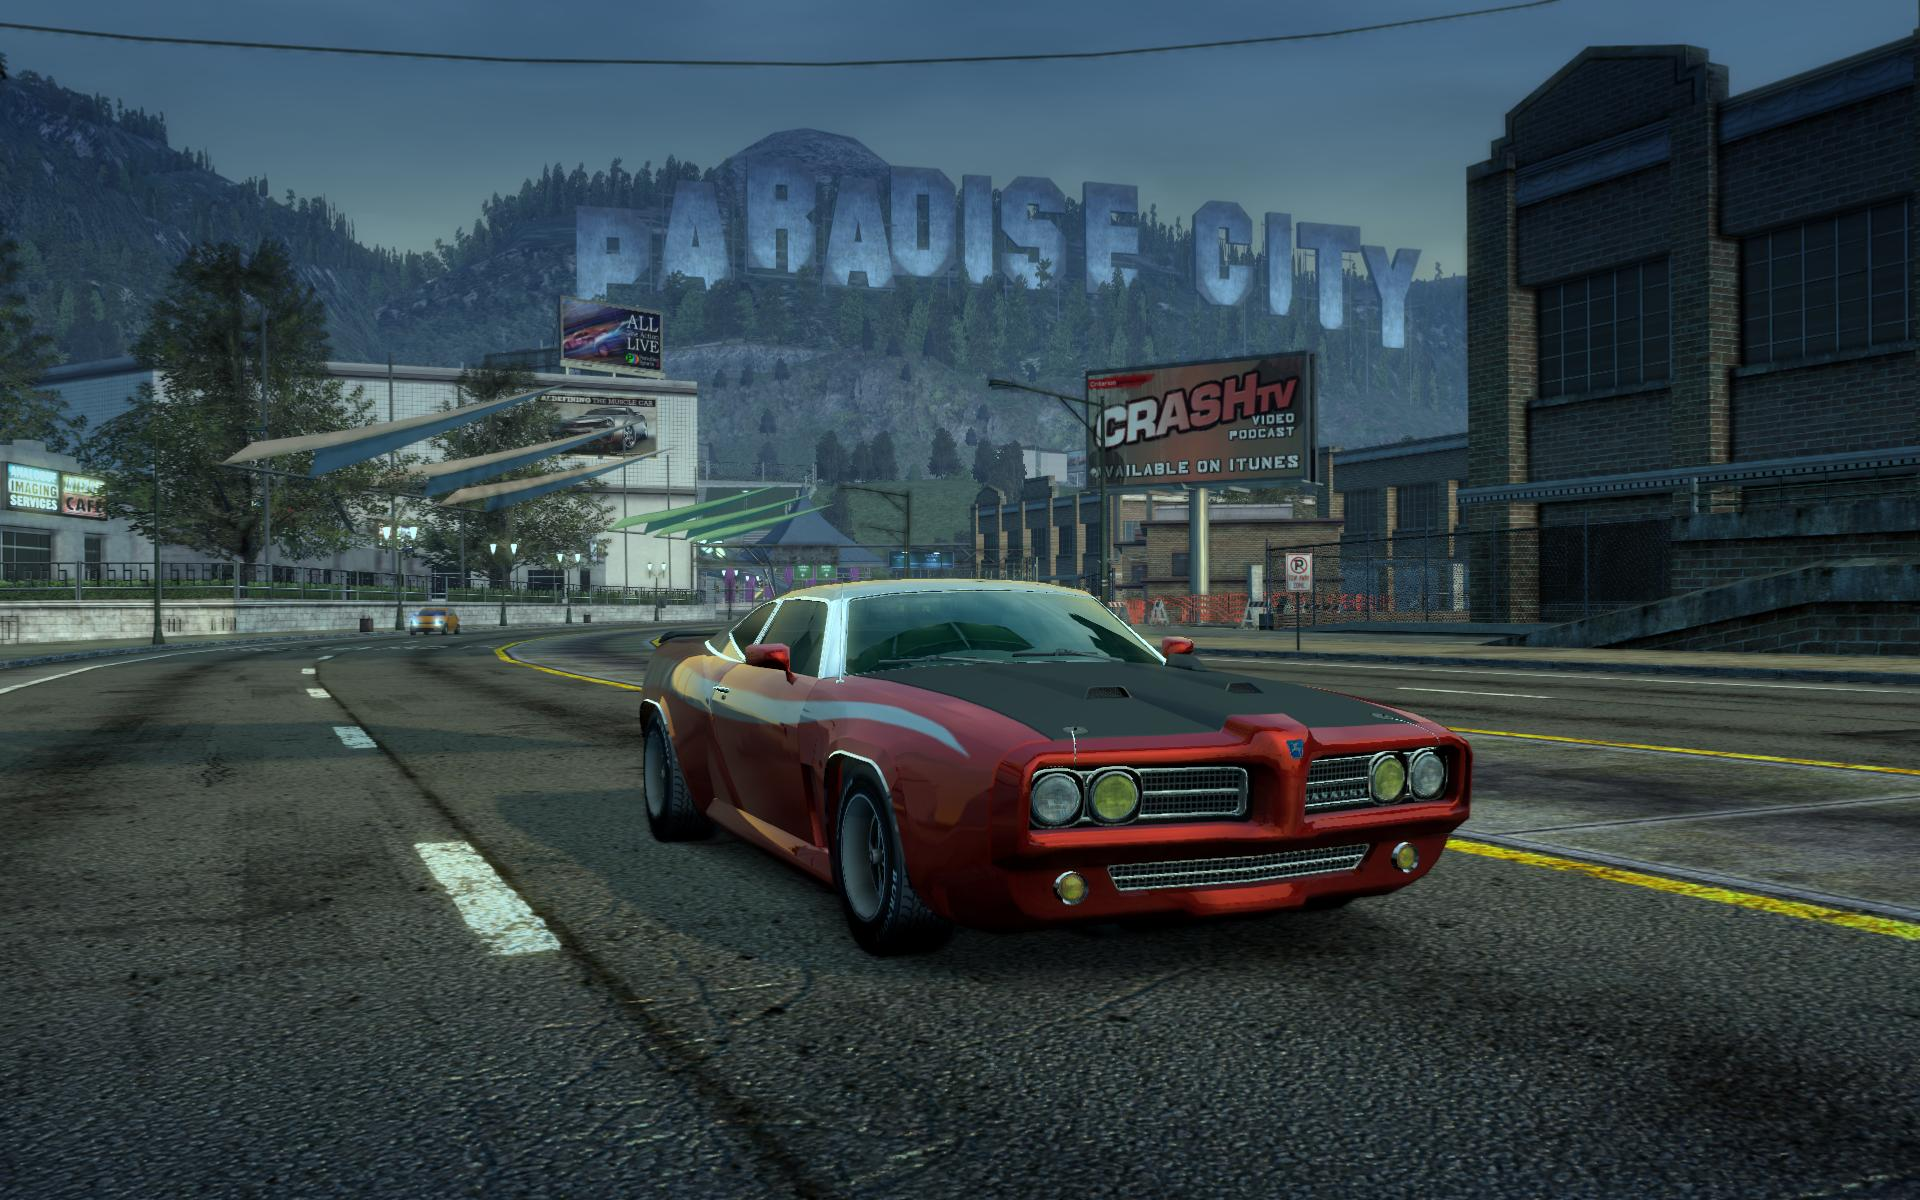 Paradise City sign